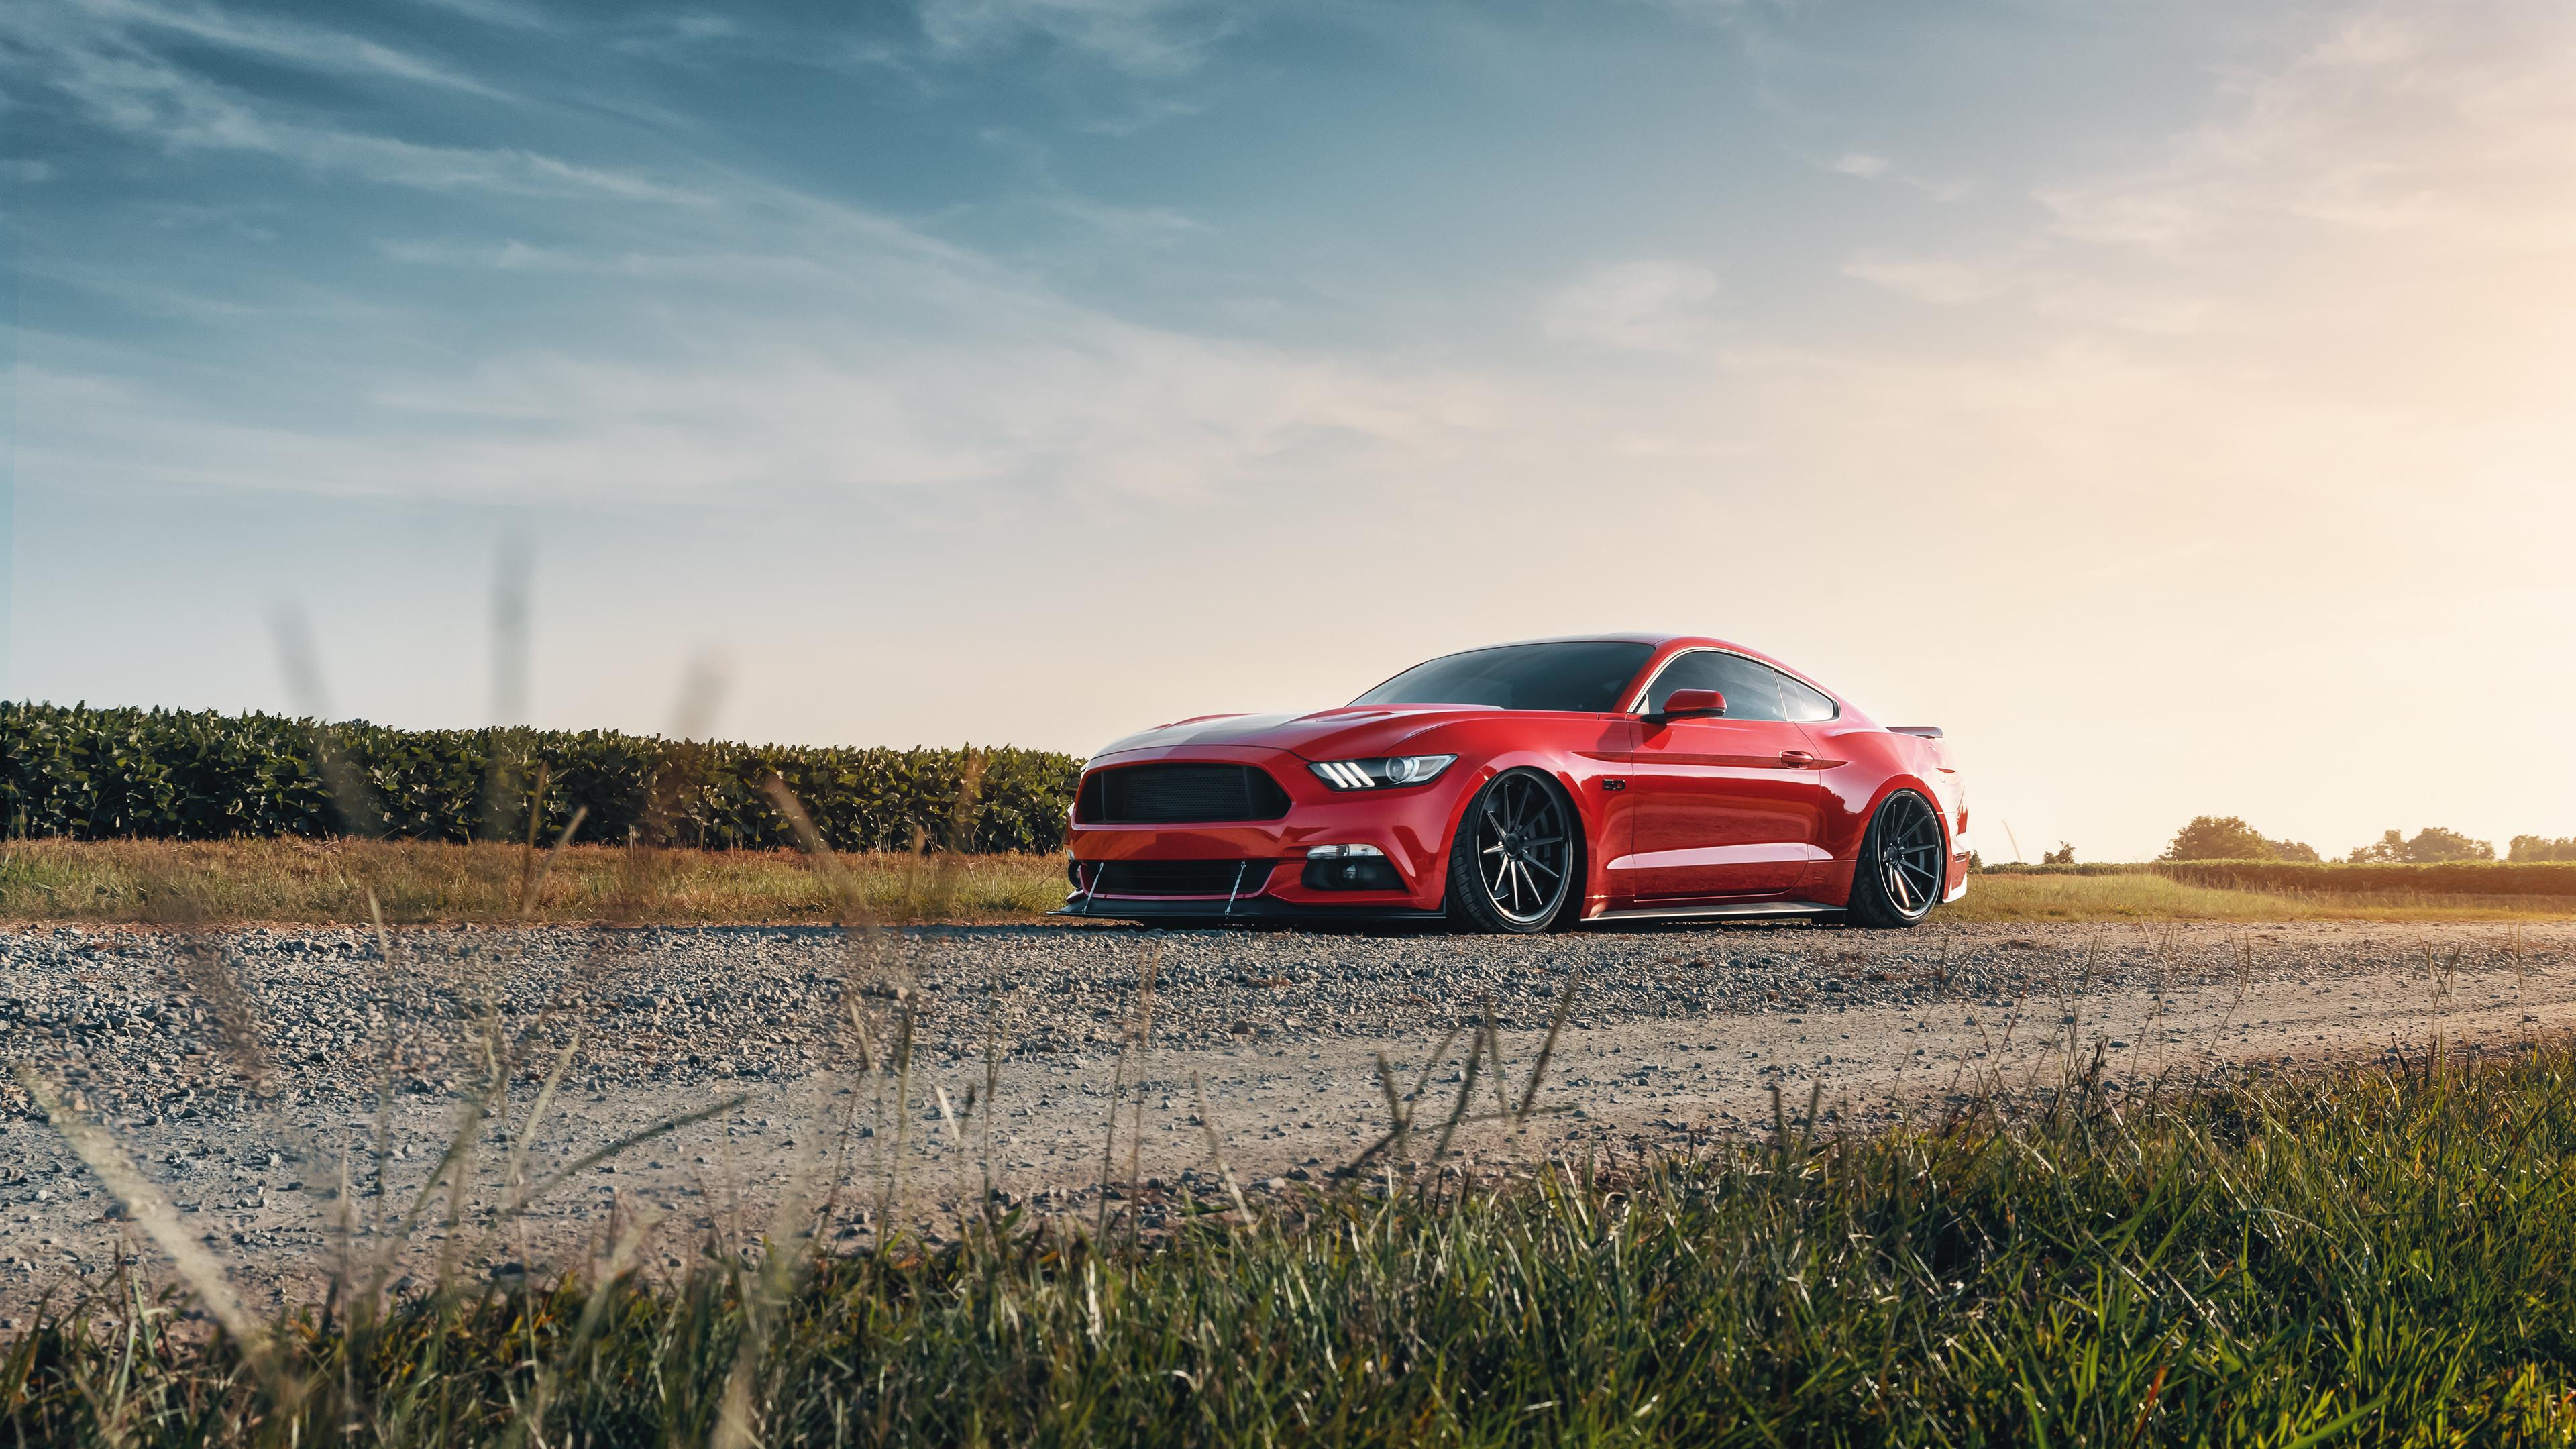 ford mustang gt red 4k 1555206876 - Ford Mustang GT Red 4k - hd-wallpapers, ford mustang wallpapers, cars wallpapers, behance wallpapers, 4k-wallpapers